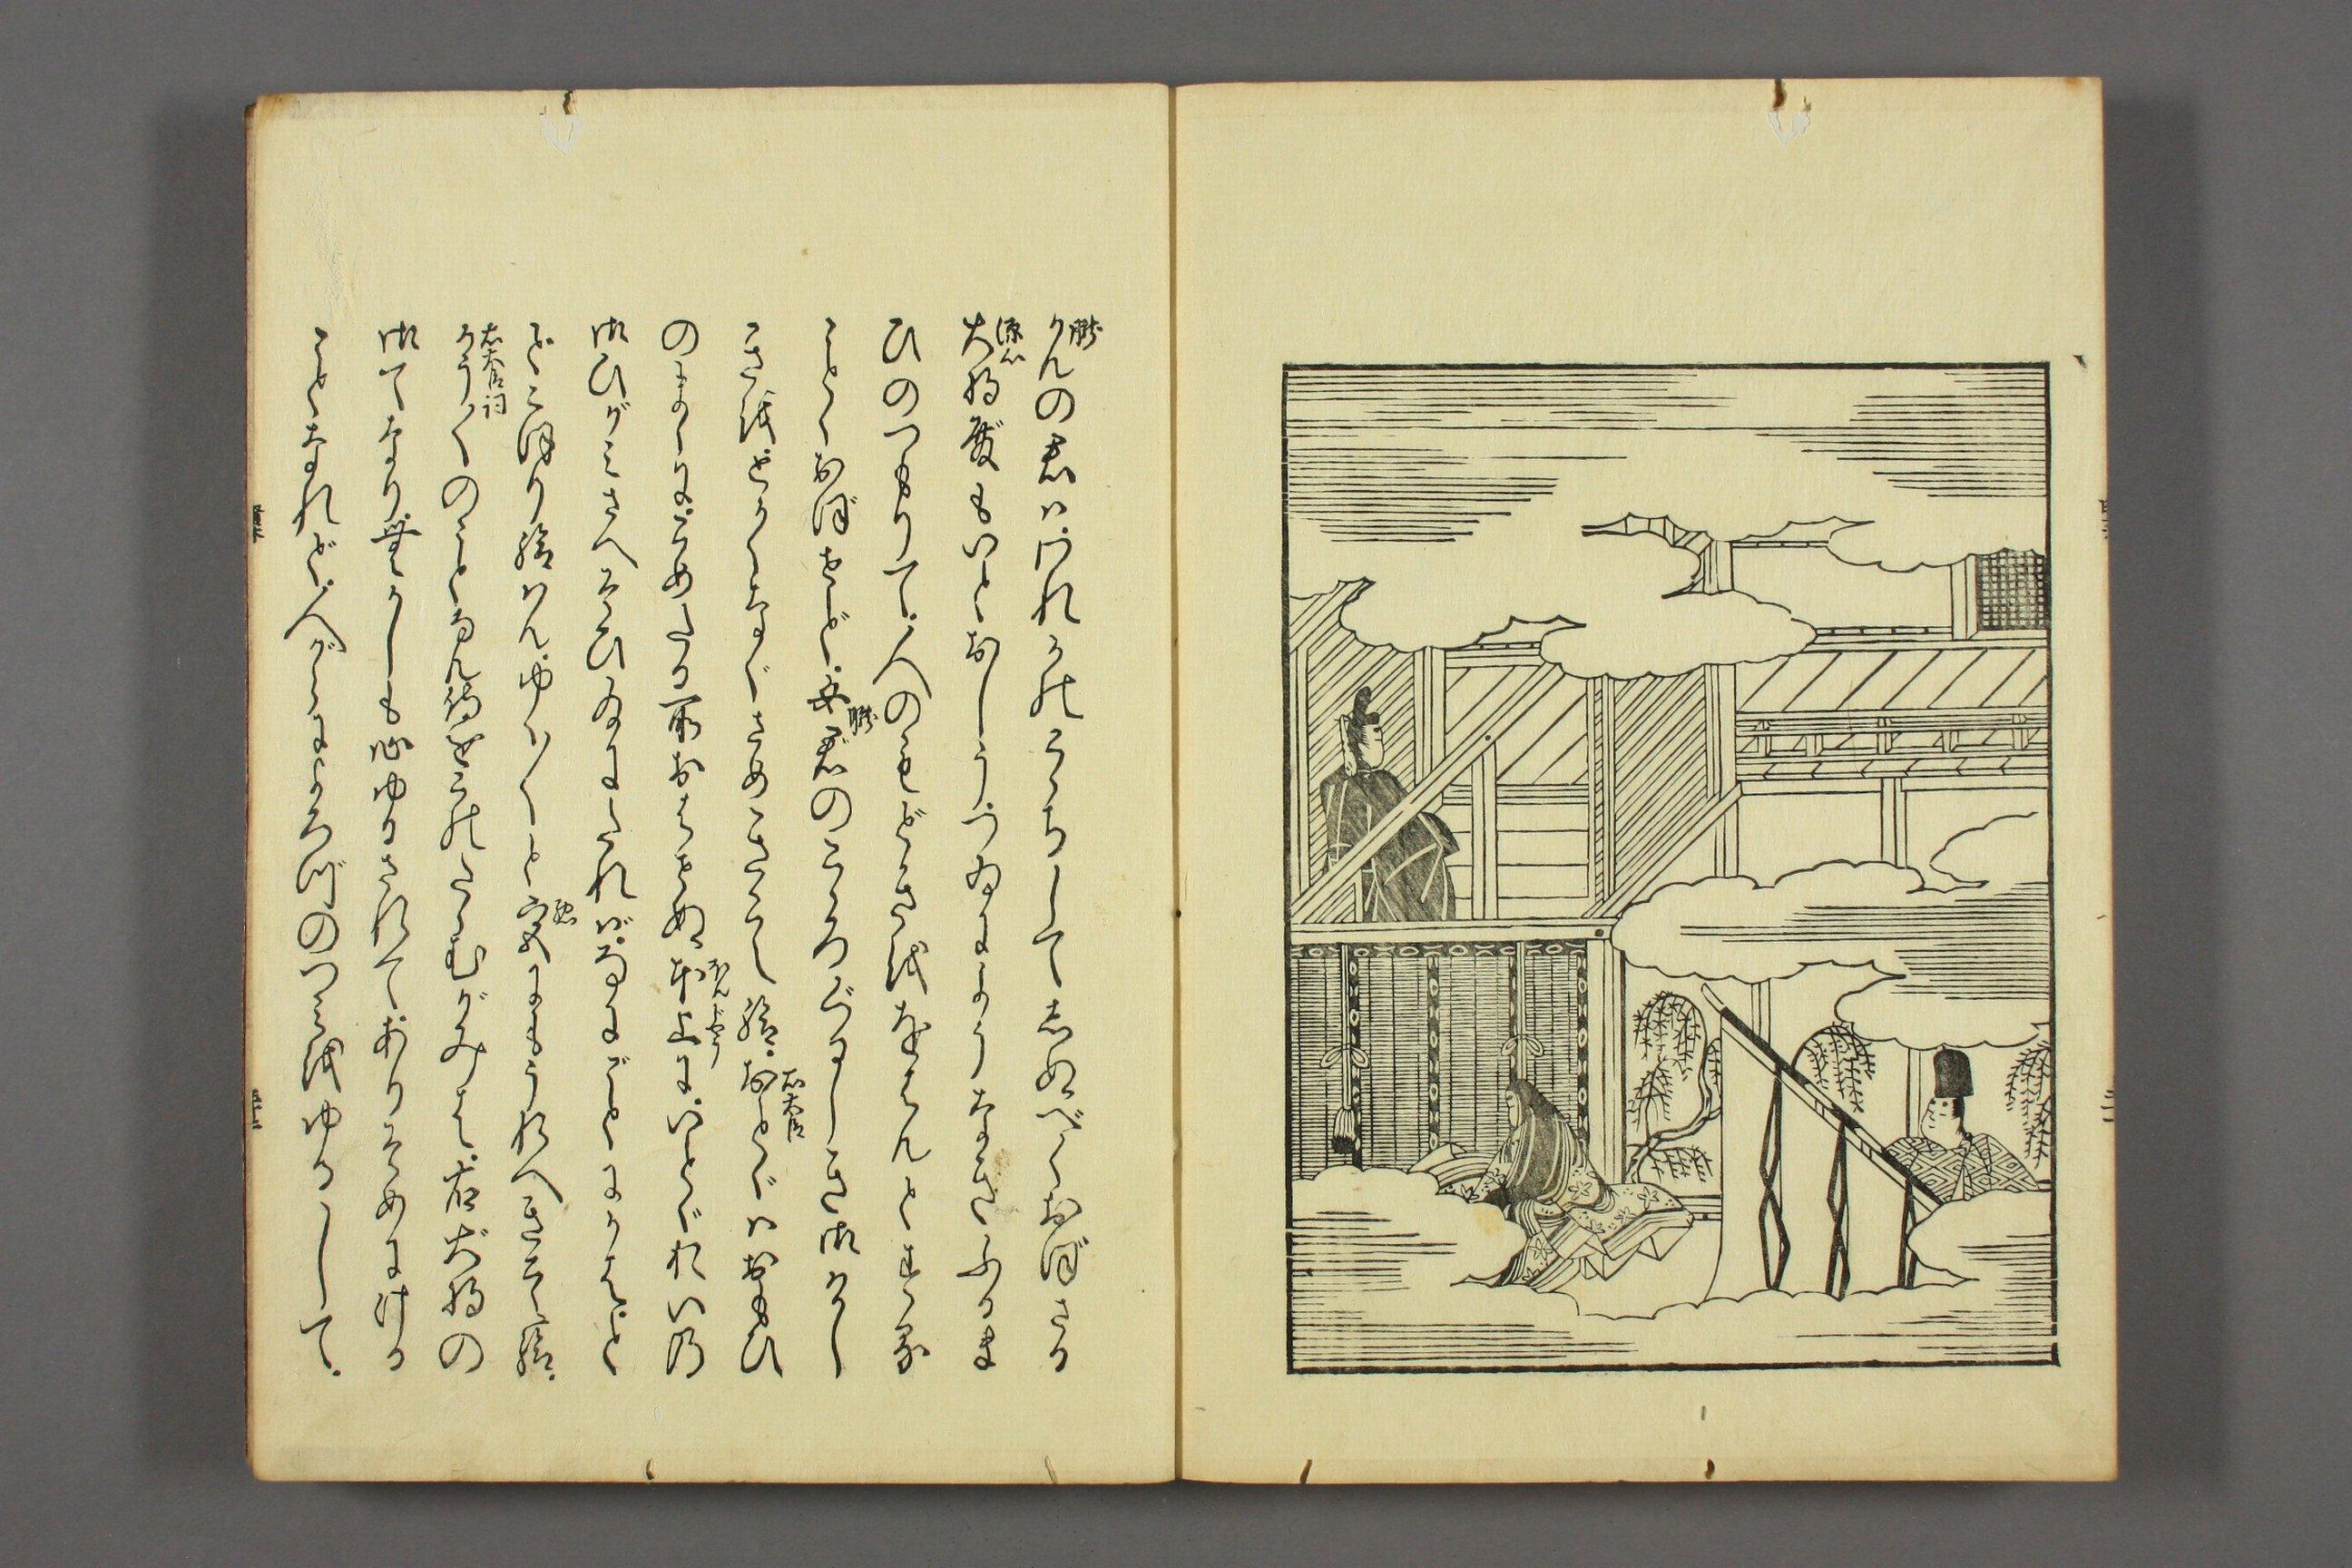 http://archive.wul.waseda.ac.jp/kosho/bunko30/bunko30_a0007/bunko30_a0007_0010/bunko30_a0007_0010_p0053.jpg